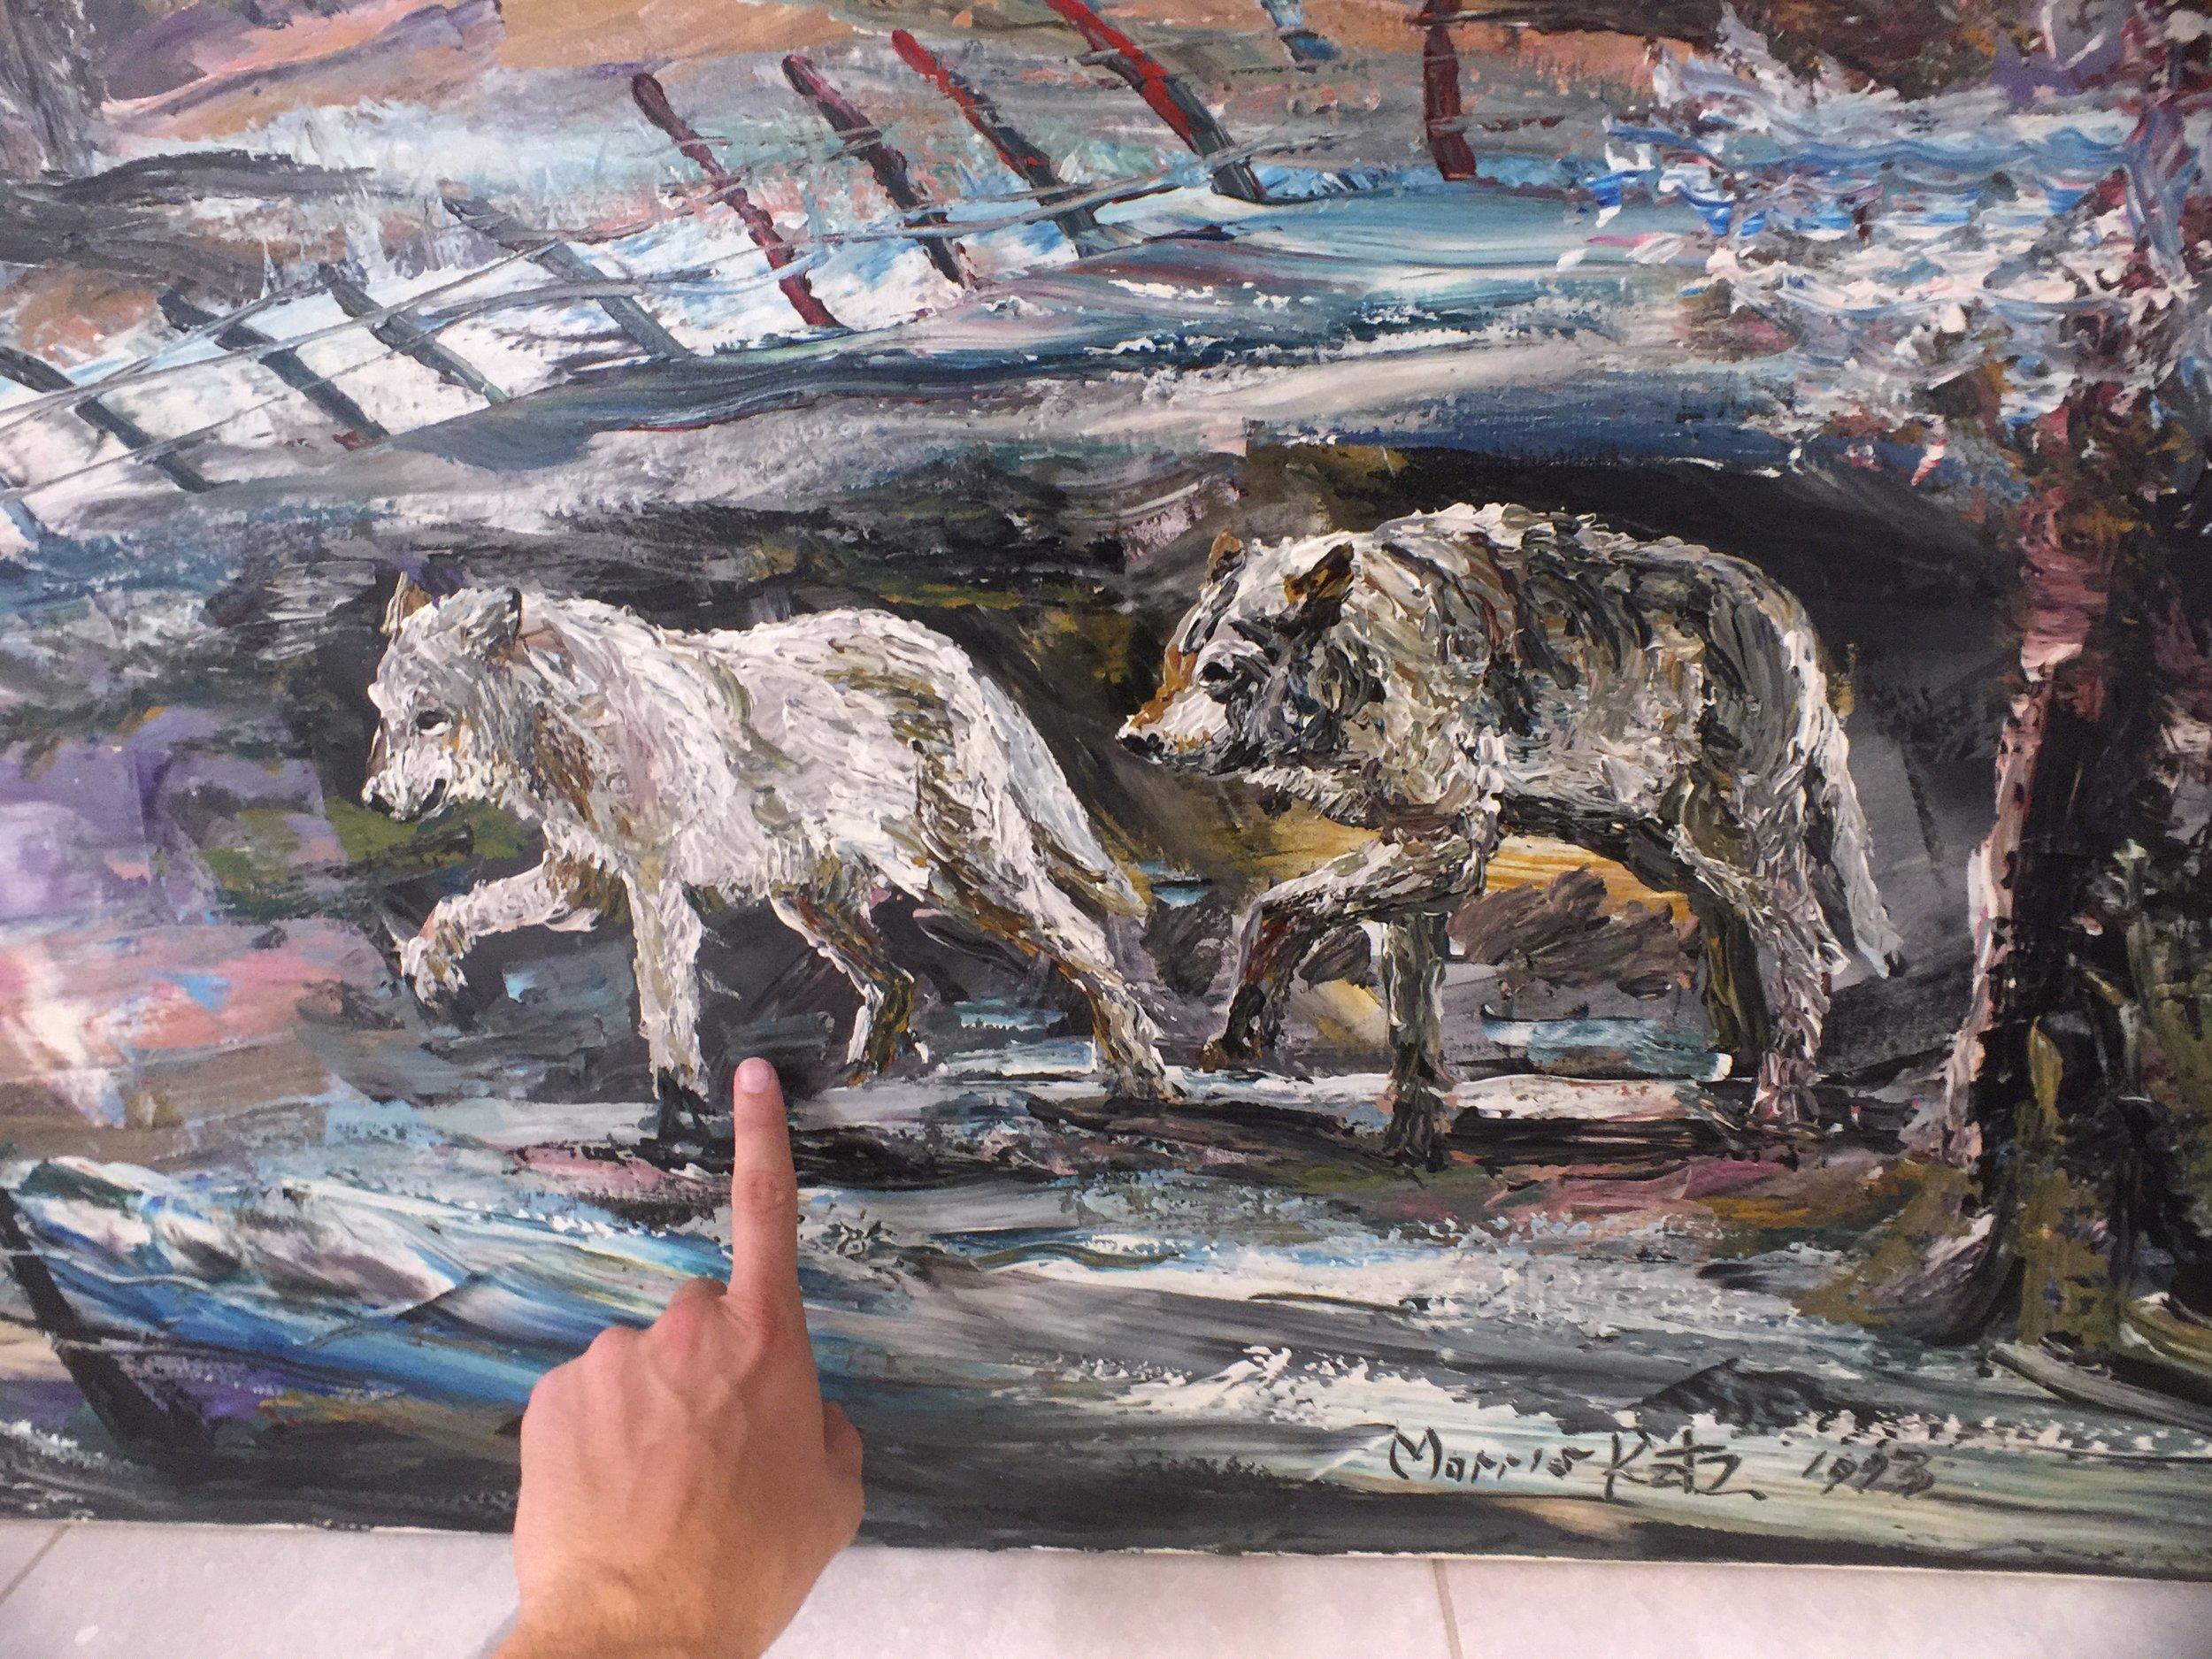 Morris Katz Painting gemälde 5.JPG